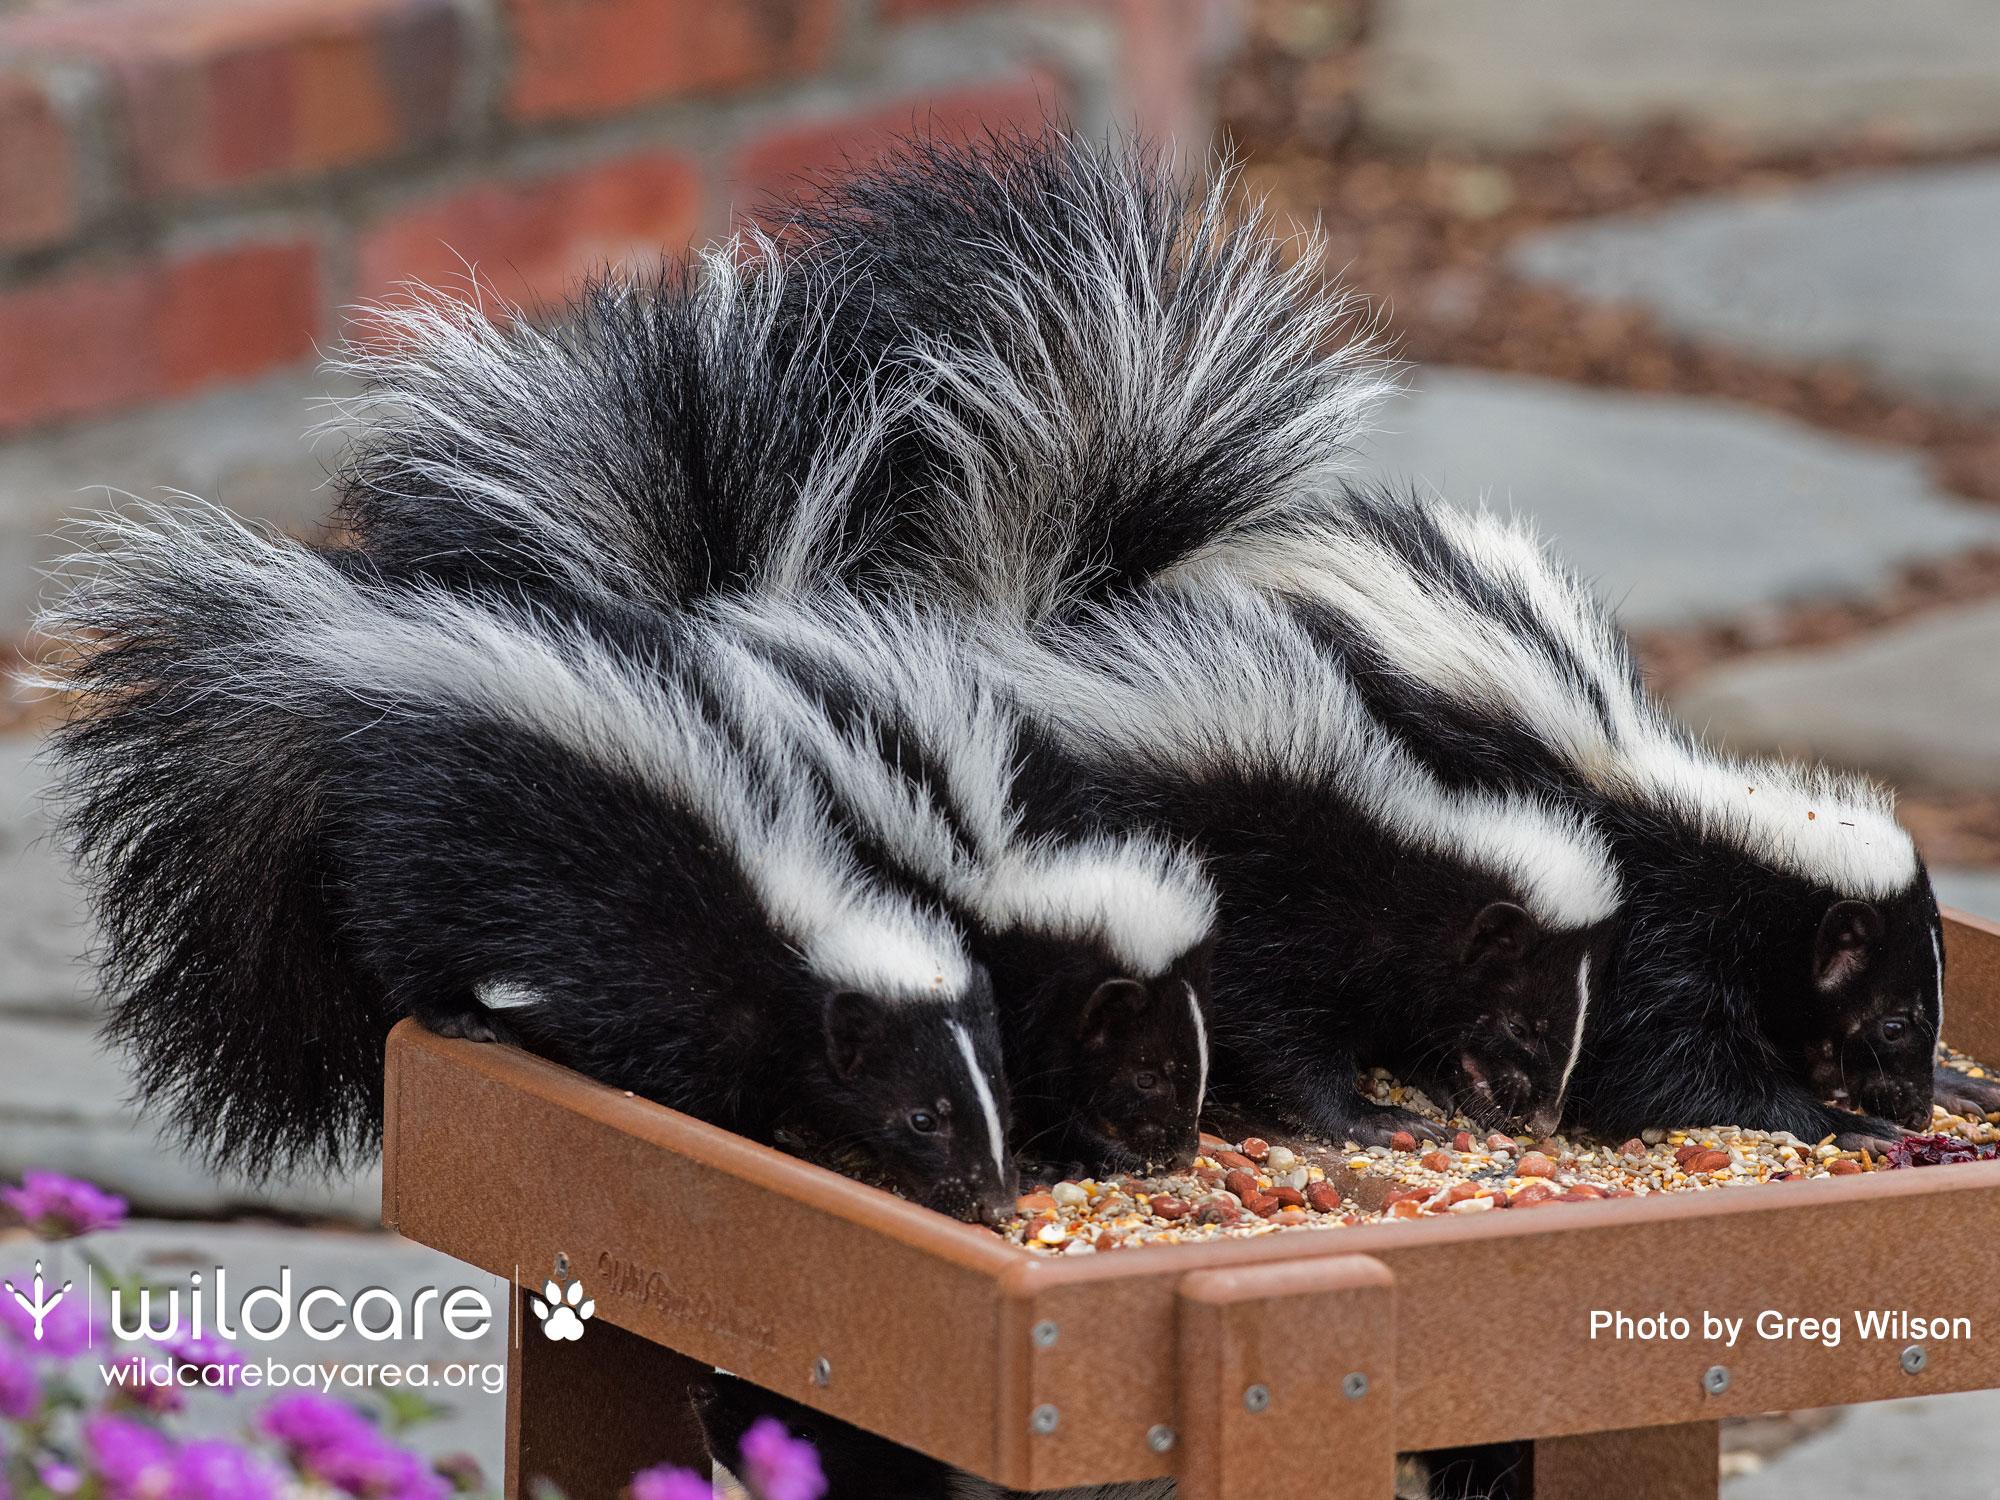 Baby skunks at a bird feeder. Photo by Greg Wilson